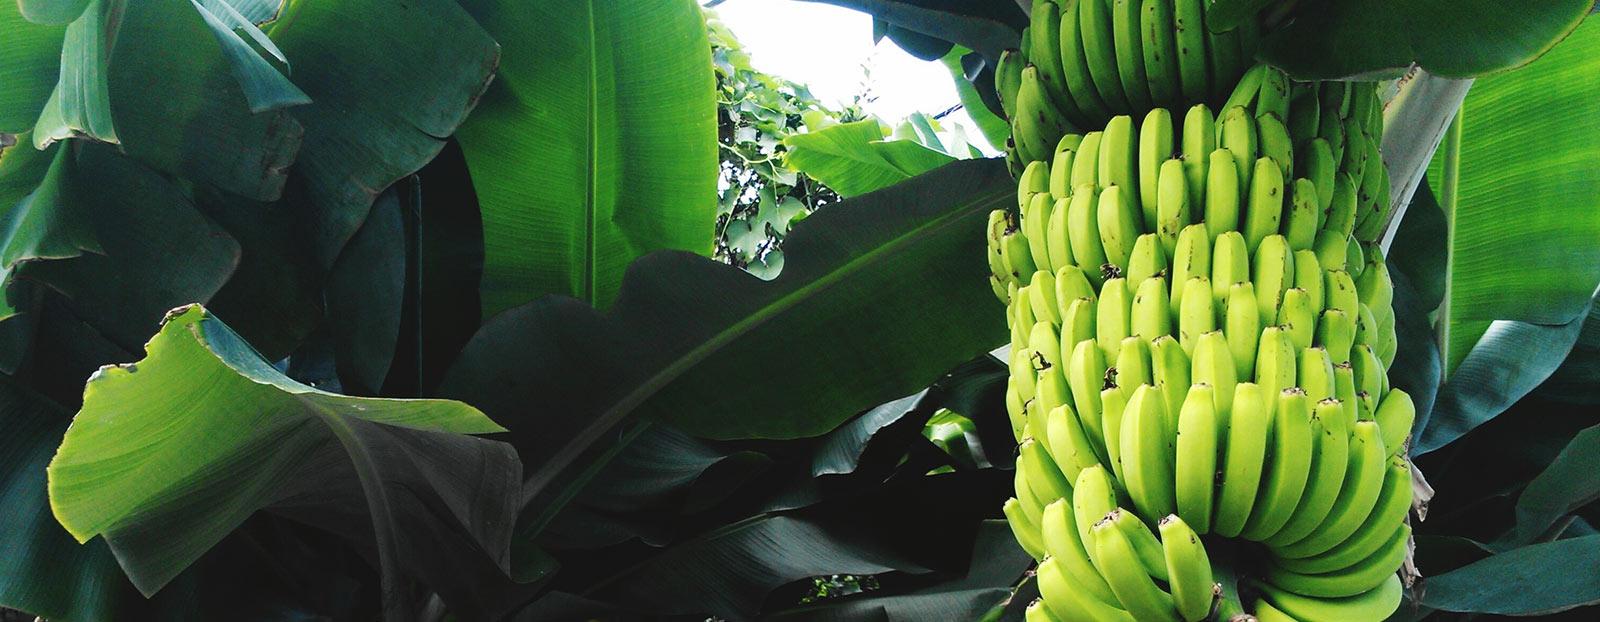 Banana tree in its natural habitat